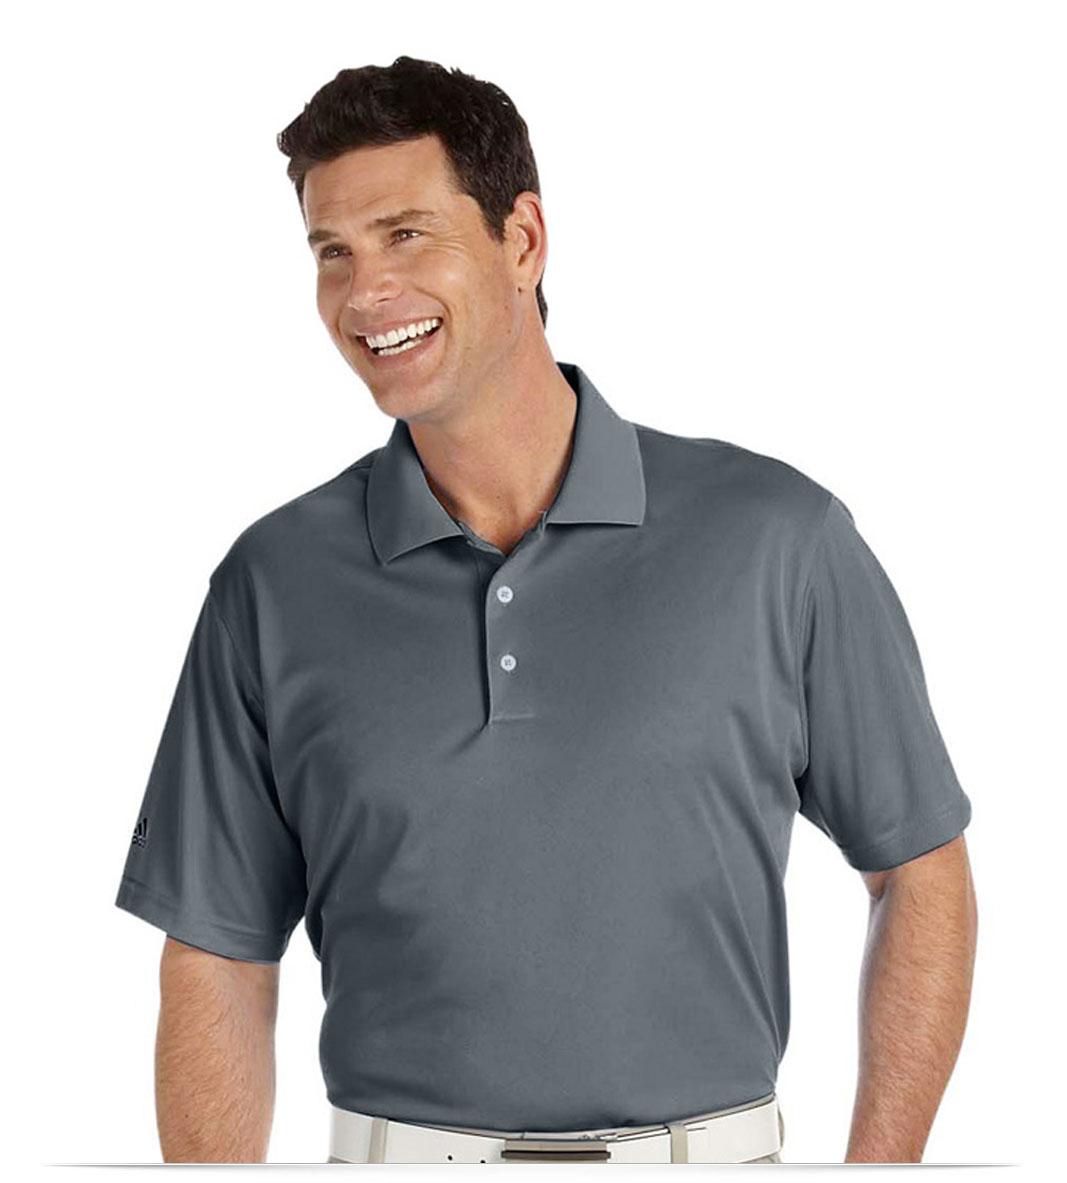 Custom Adidas Polo Shirt